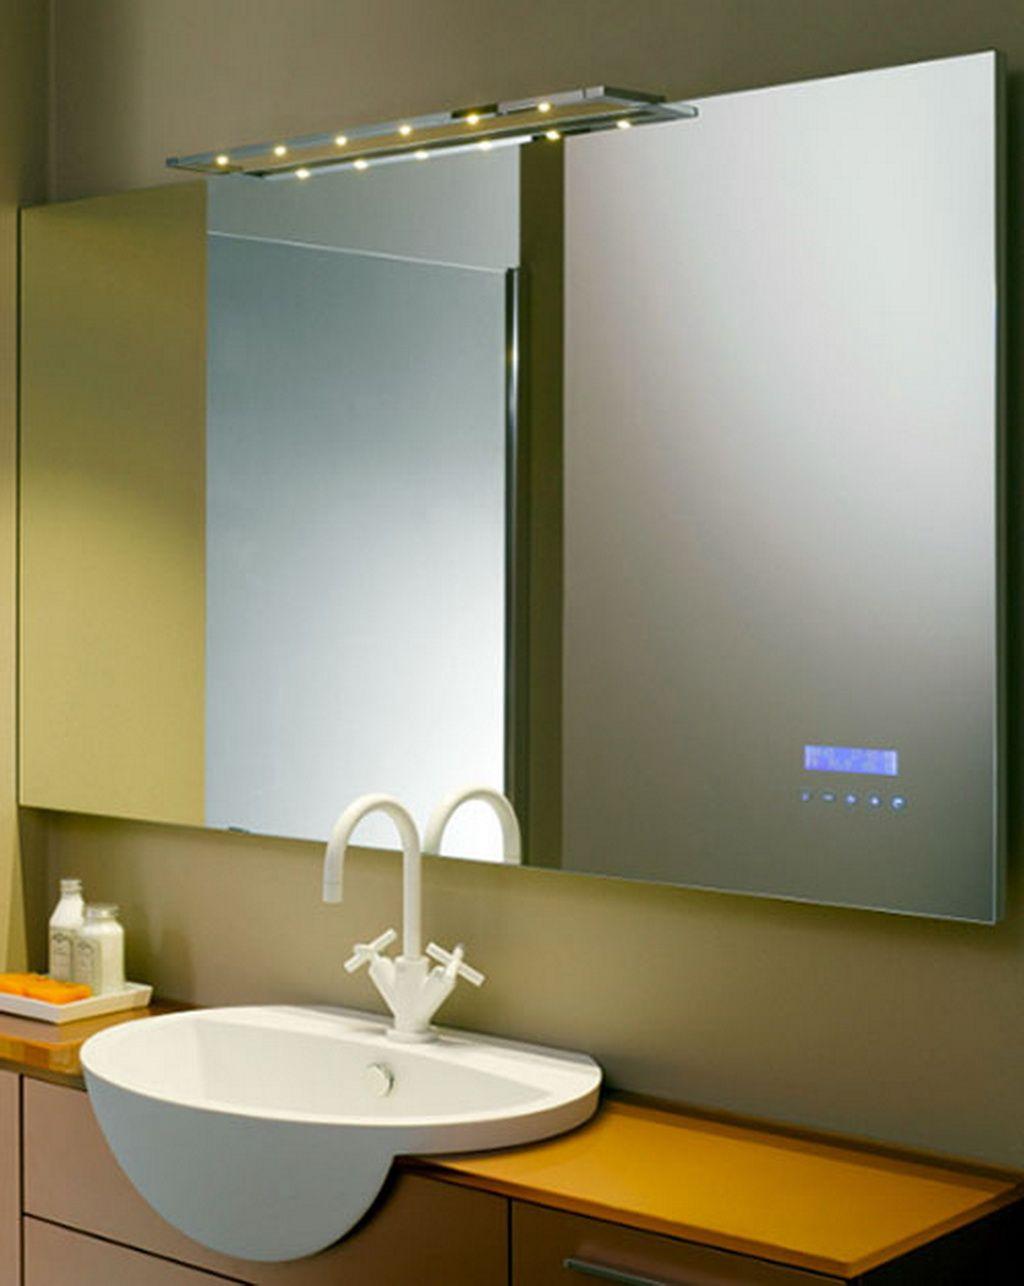 Website Picture Gallery Bathroom Modern And Unique Bathroom Furniture Ideas Use Elegant Bathroom Mirror Ideas With Grade Styles